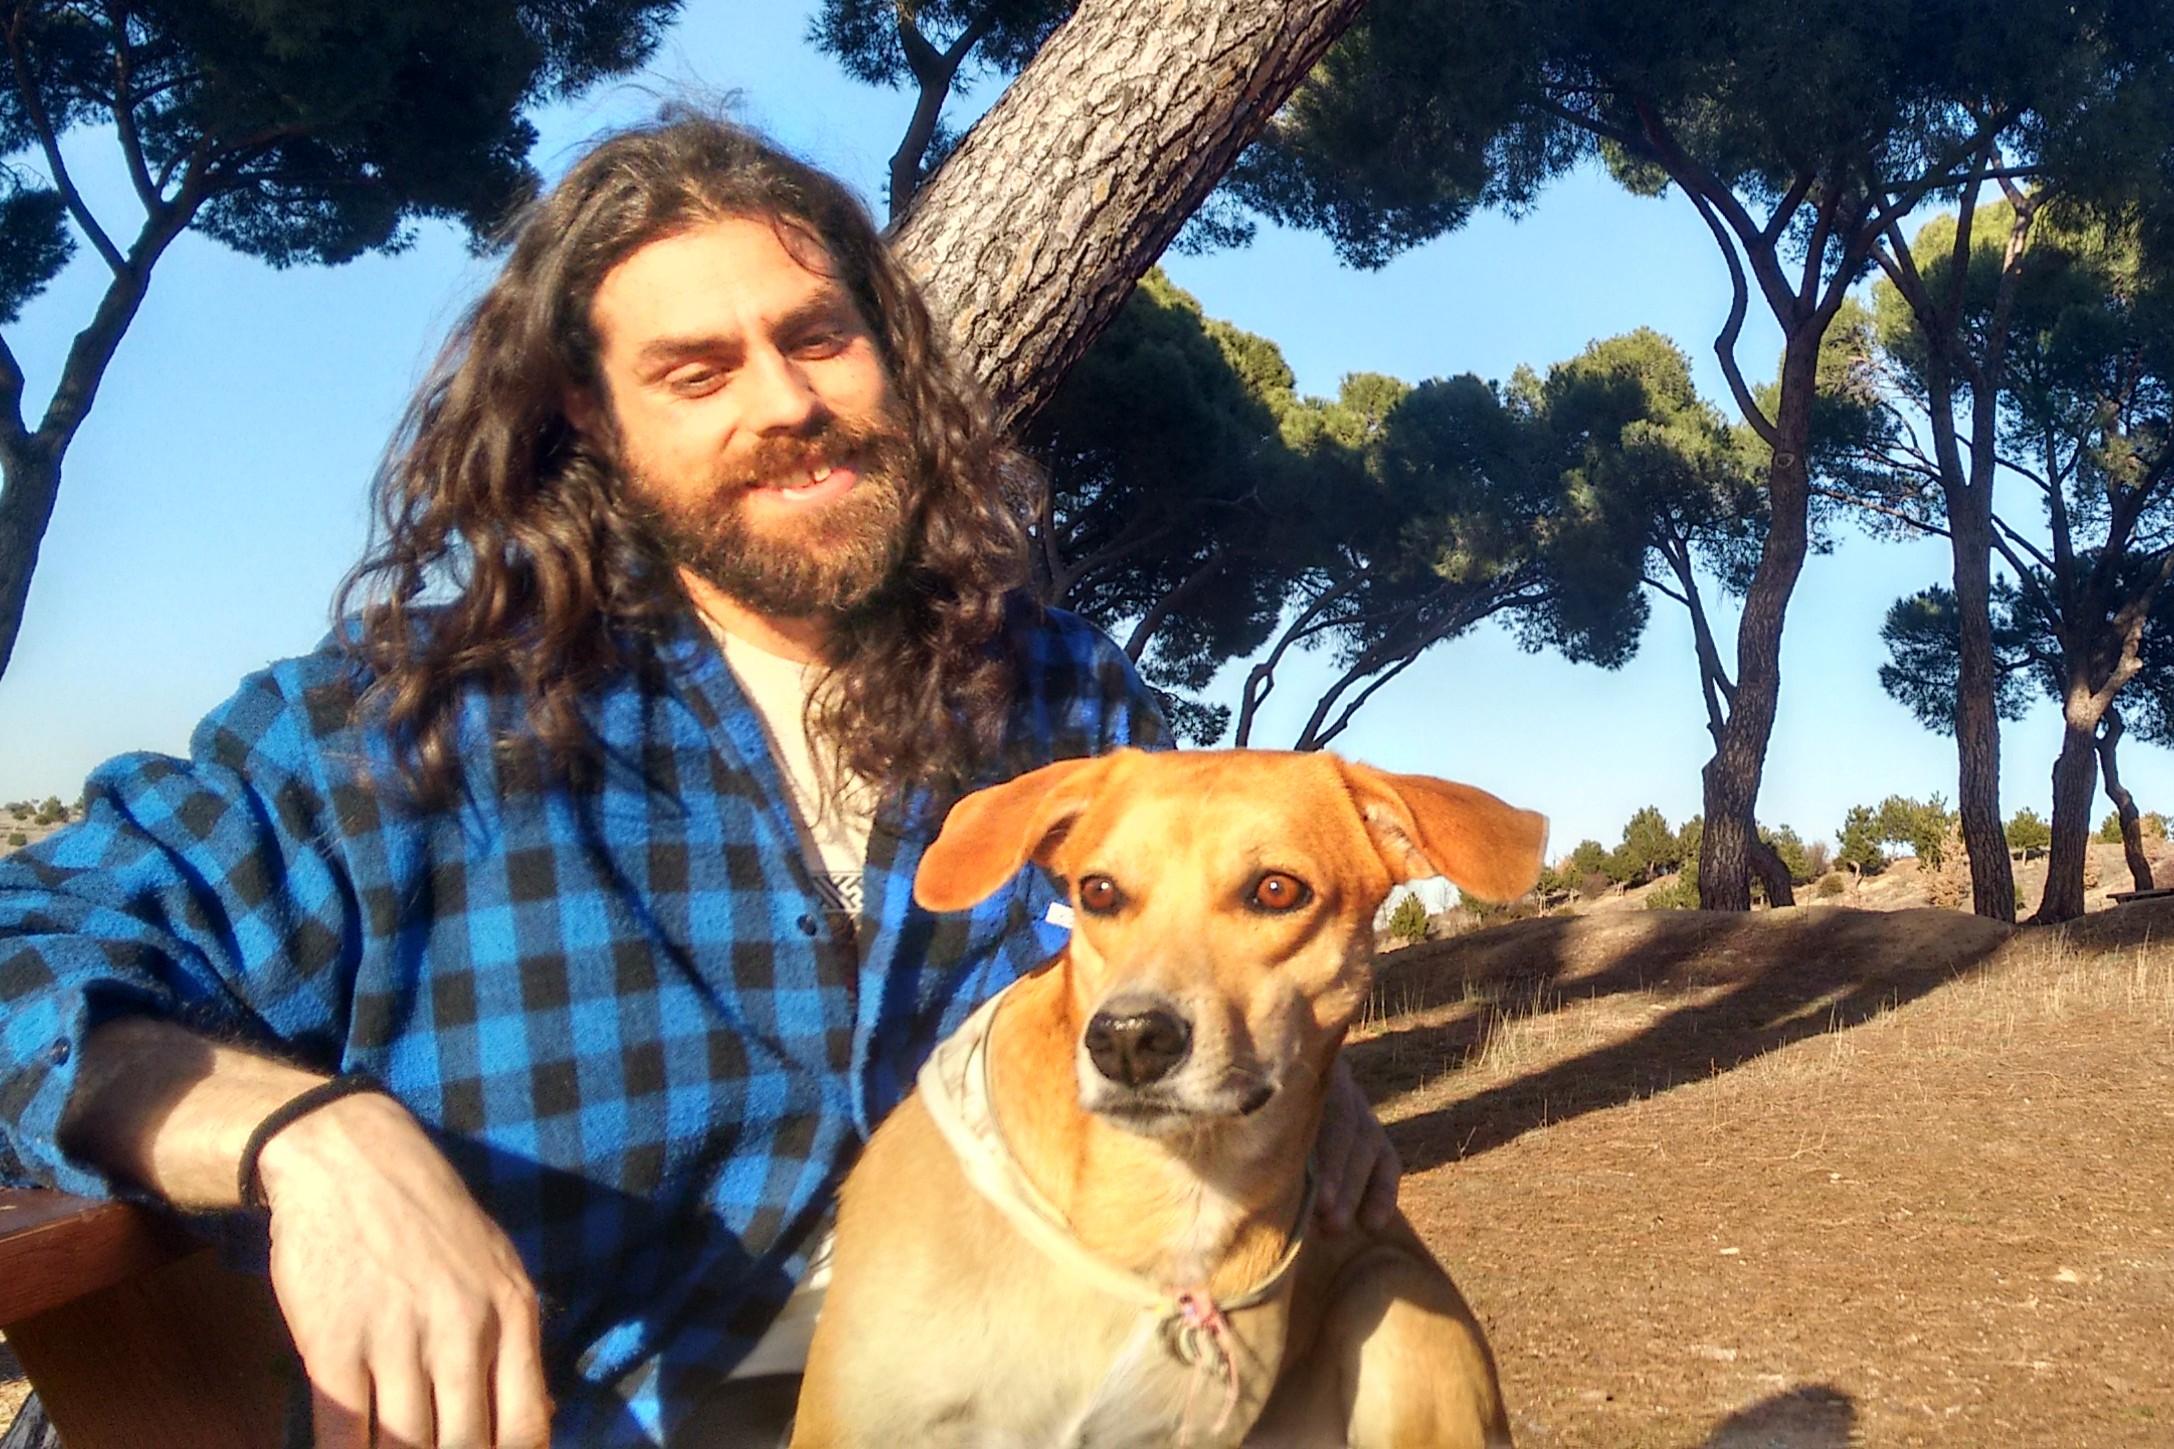 Blake Albion - Web Developer & Pro ClickerCarpenter & CraftsmanBackstage Hero